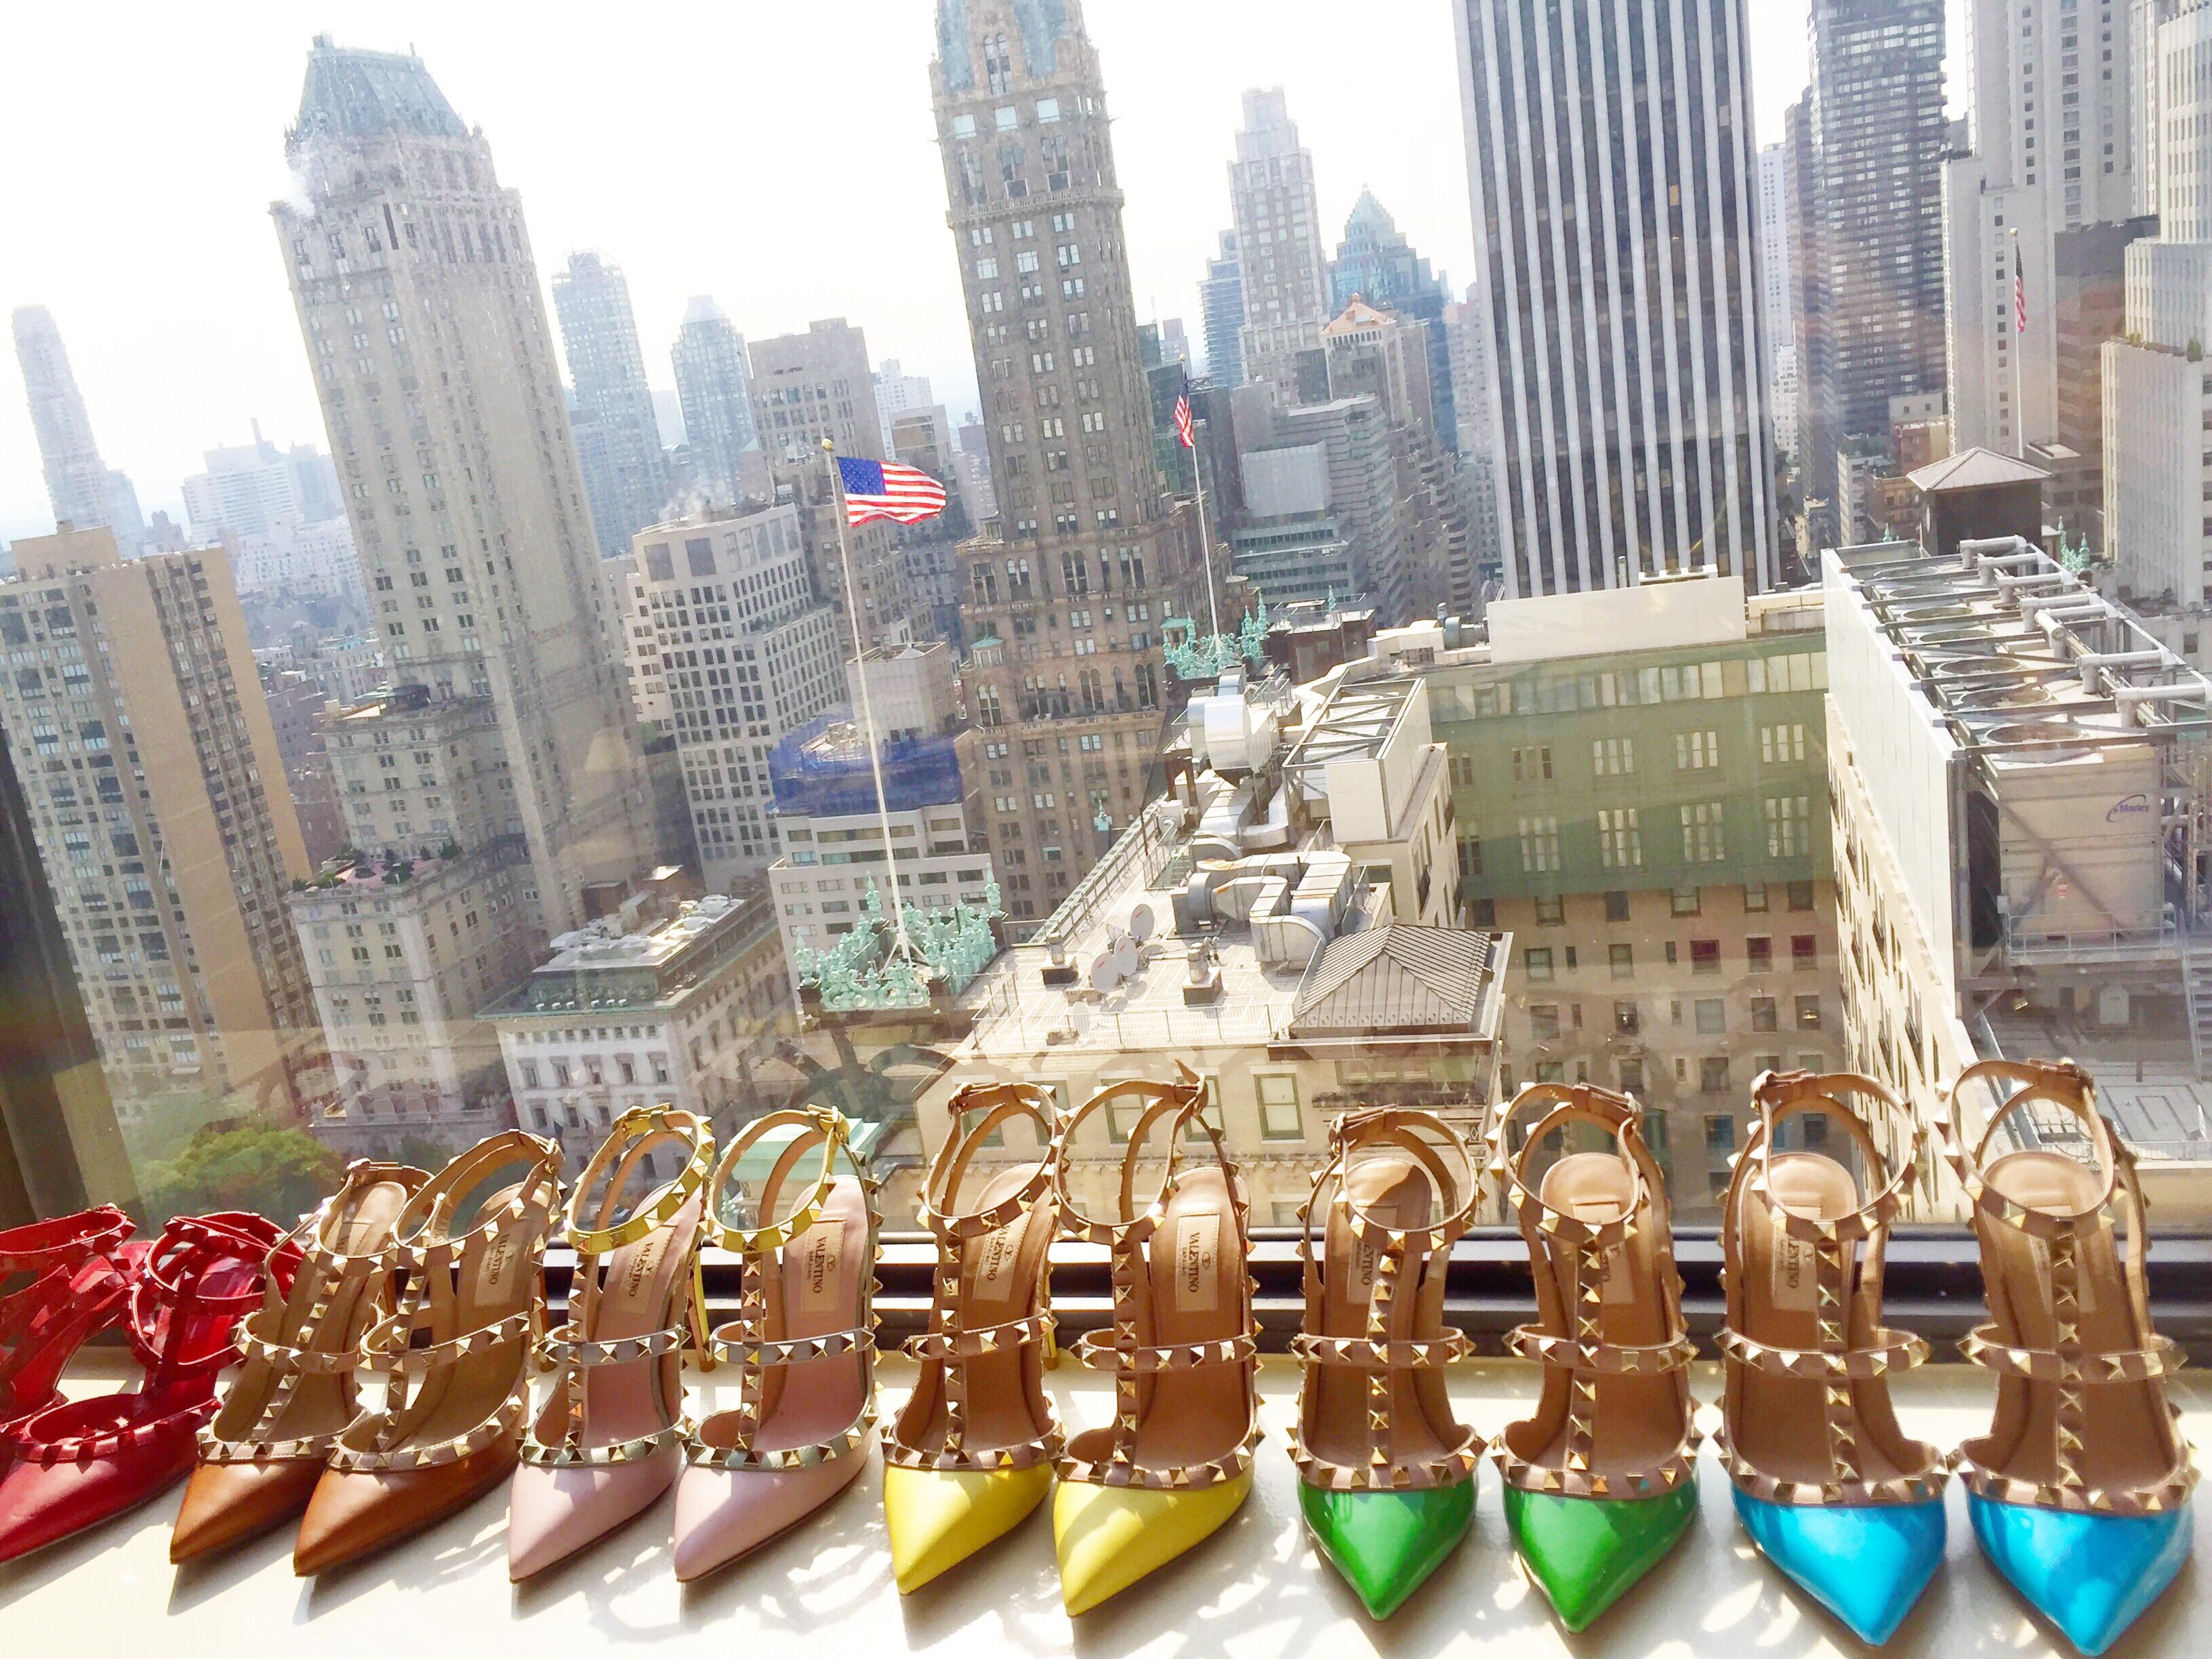 3 Stylish Ways to Store Christian Louboutin Shoes  3070dbf74ad0